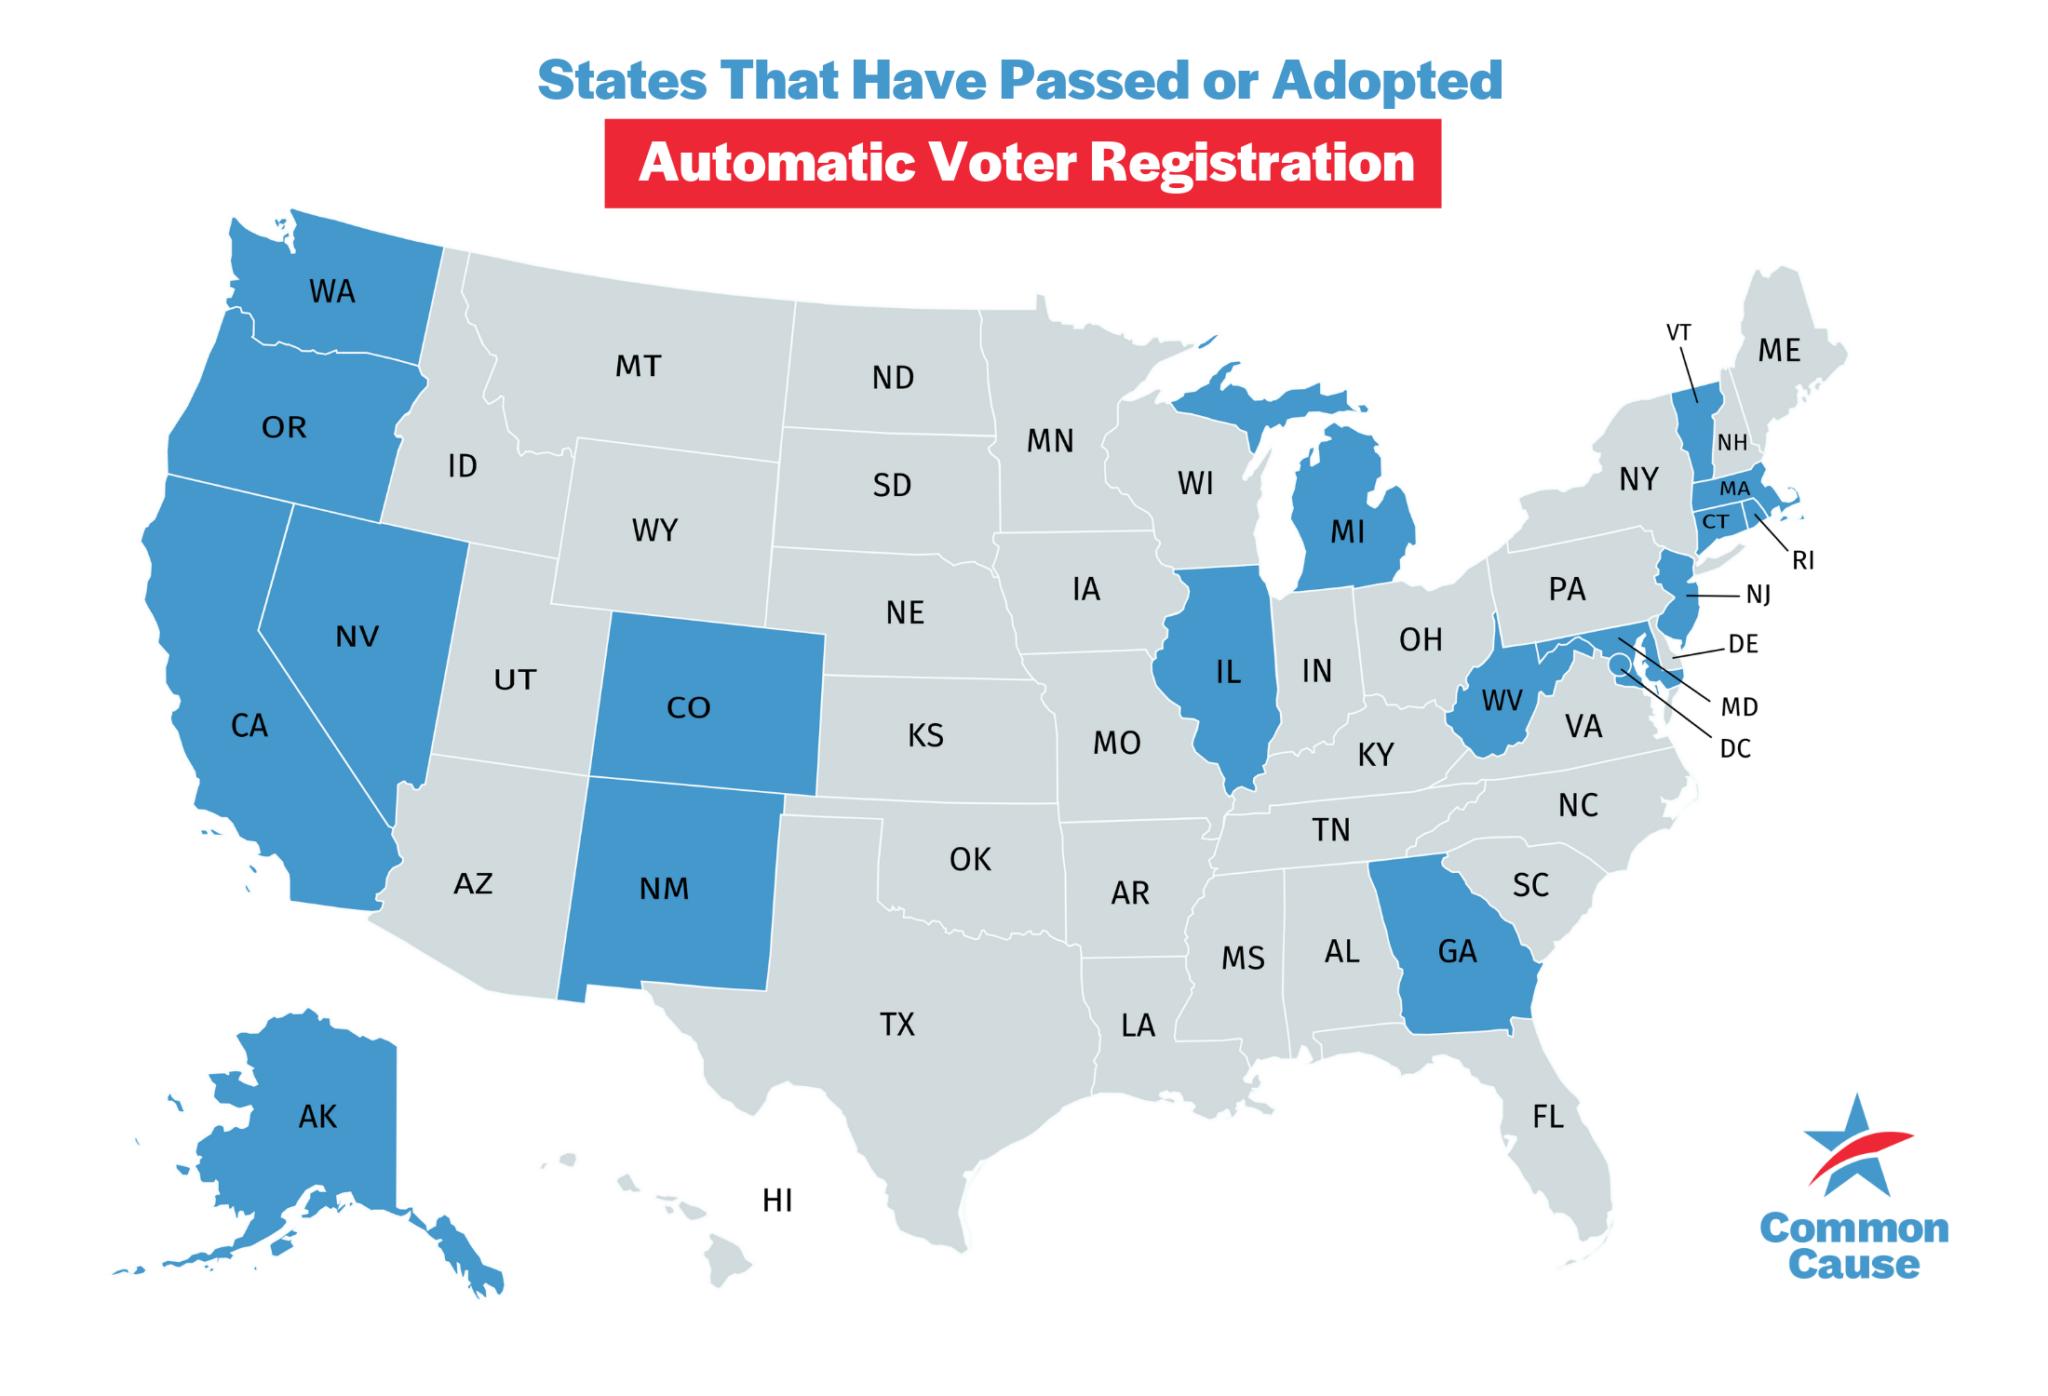 Voter Registration Modernization Common Cause